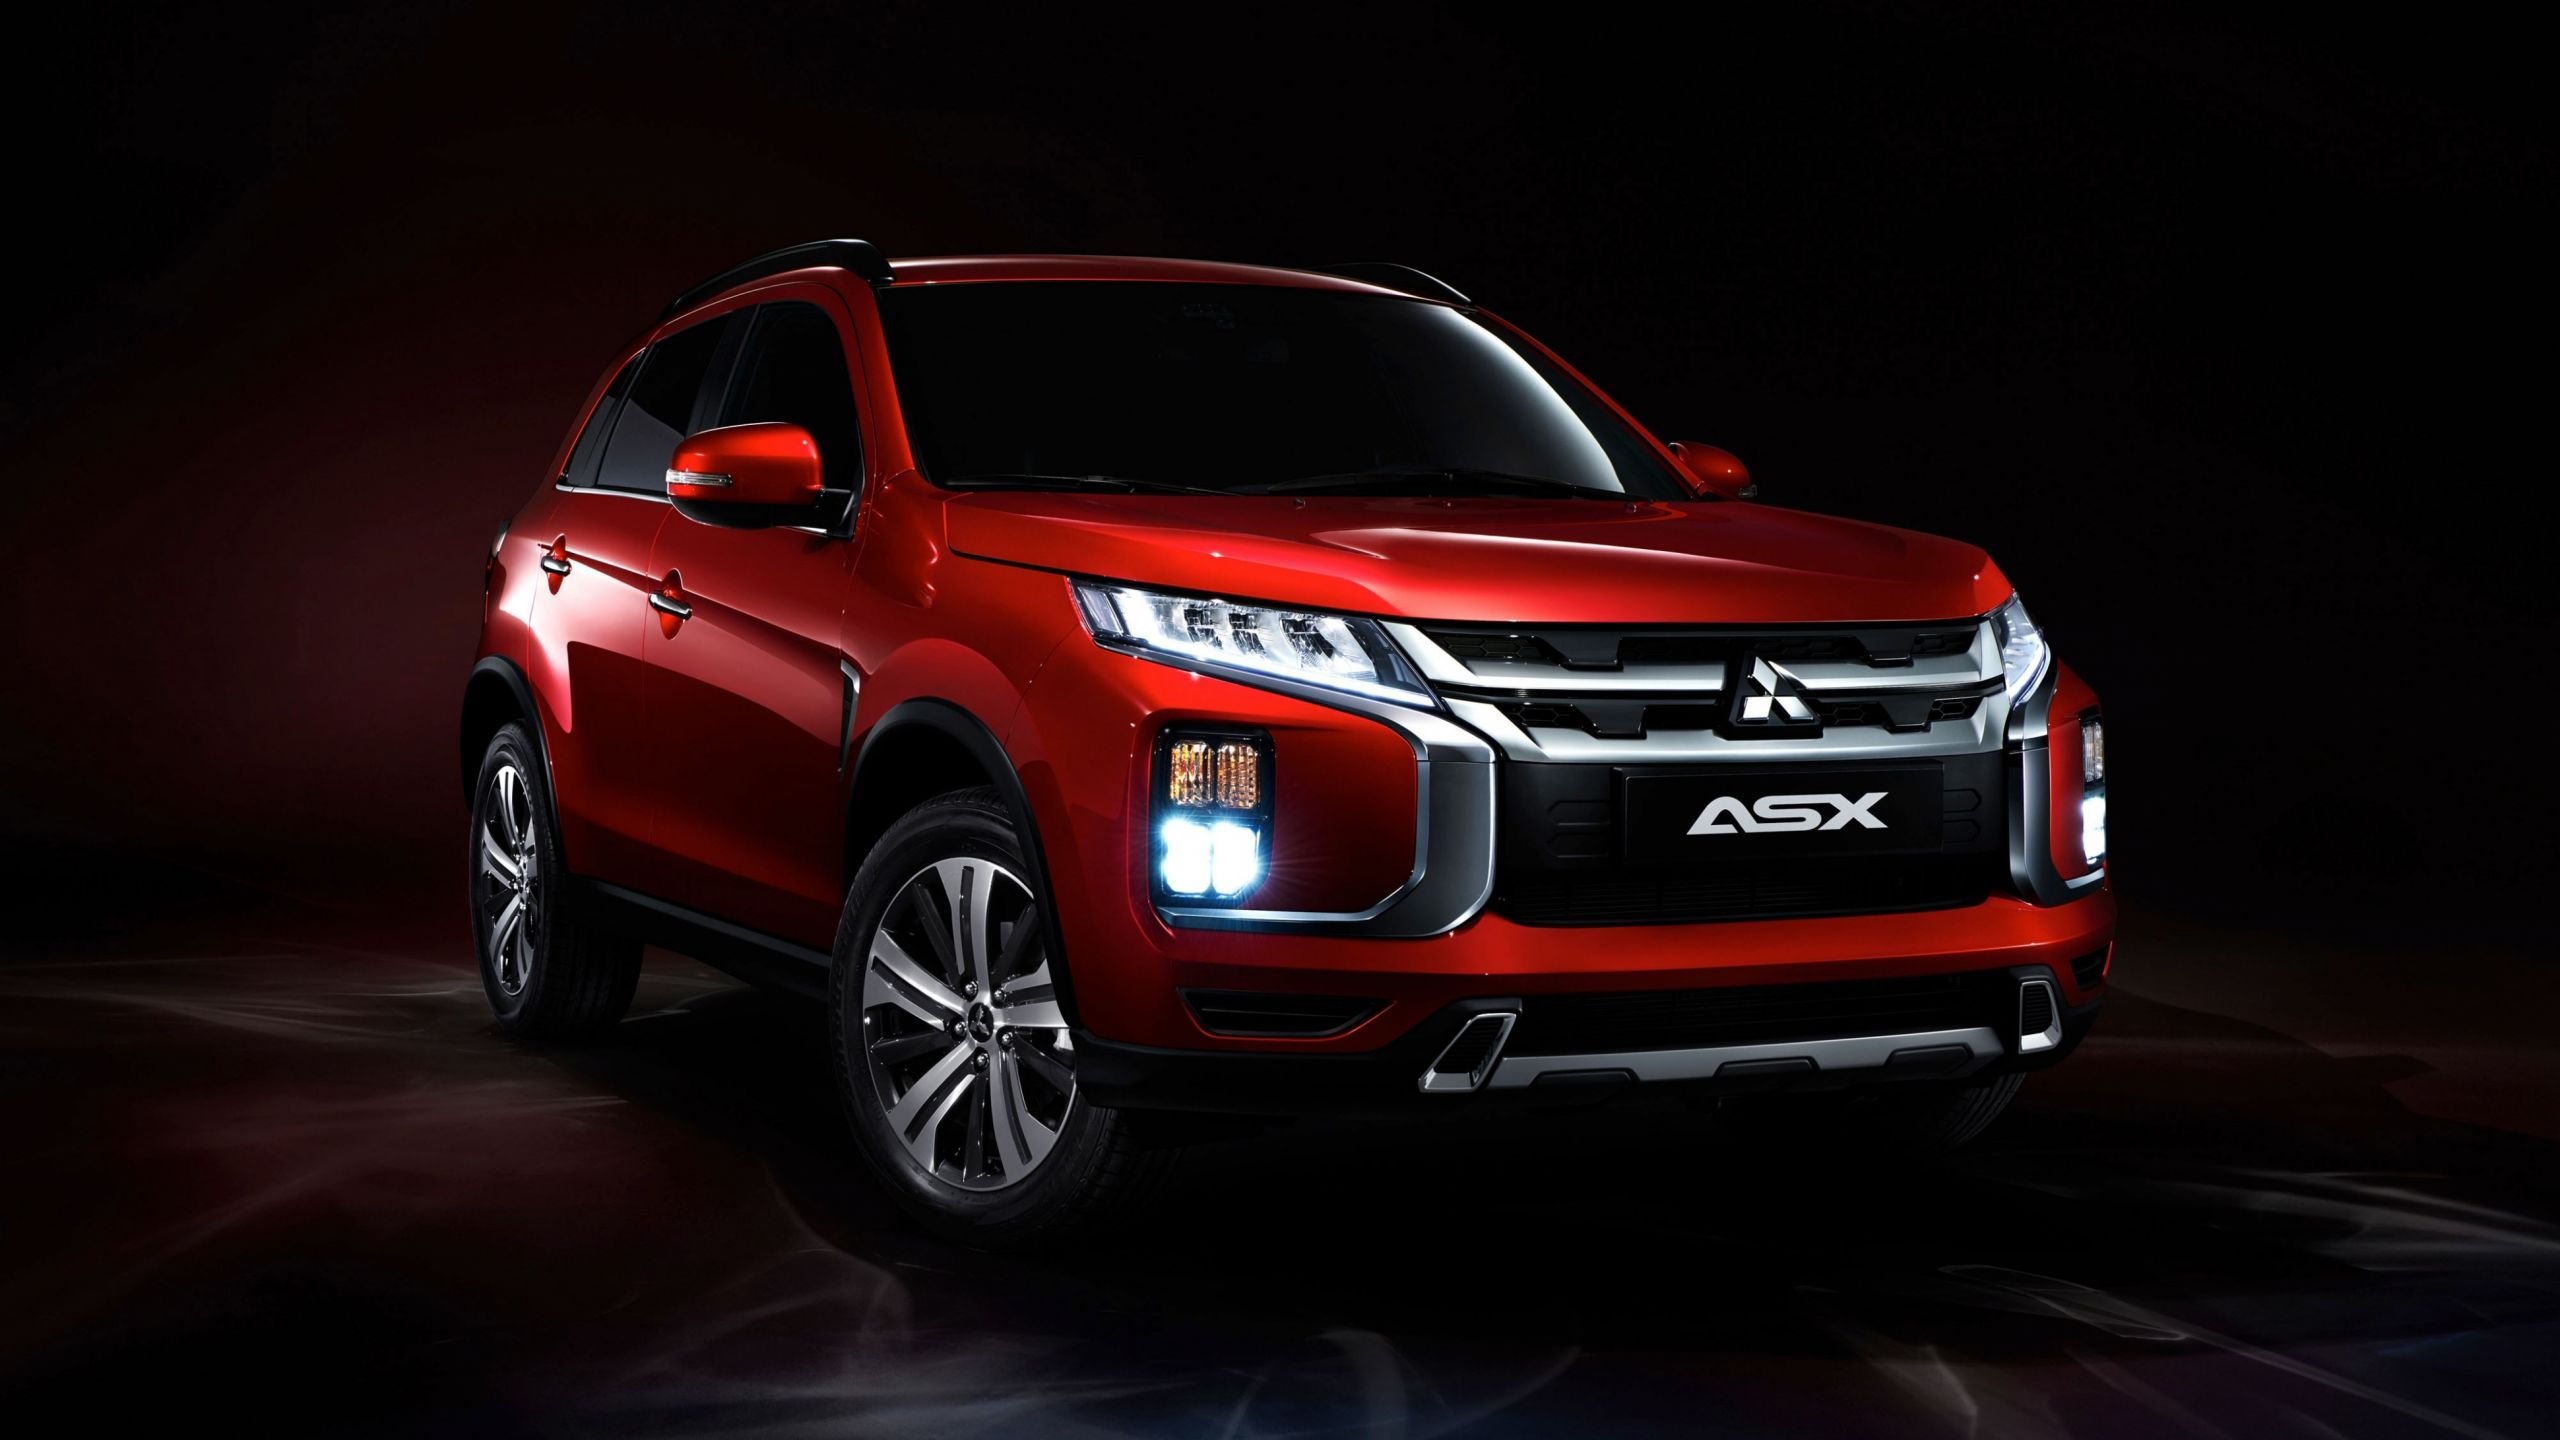 2020 Mitsubishi Outlander Sport Exterior and Interior